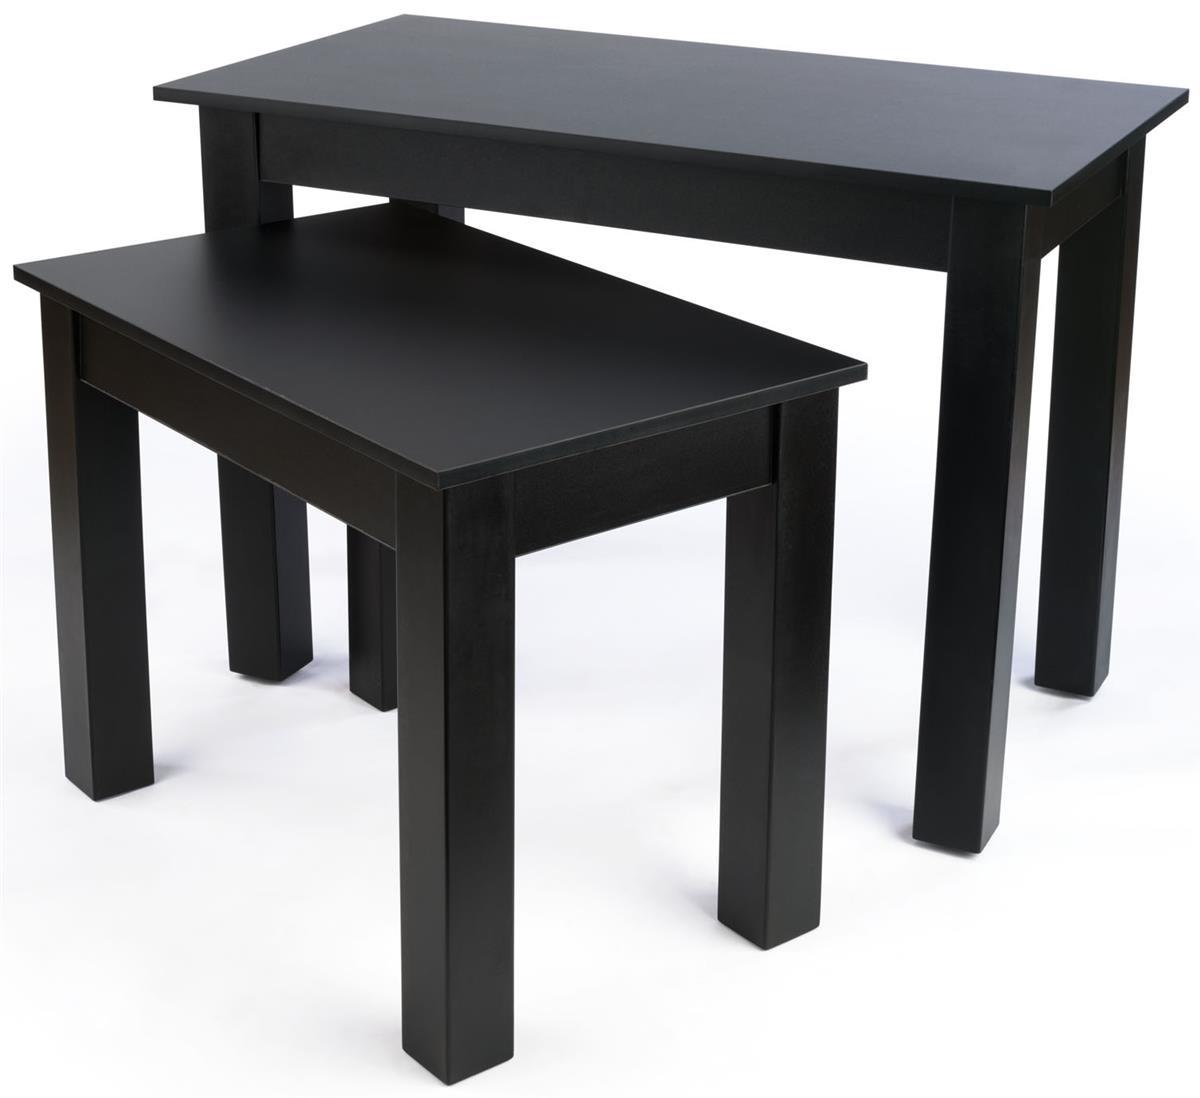 Retail Nesting Tables ~ Retail nesting table black melamine finish